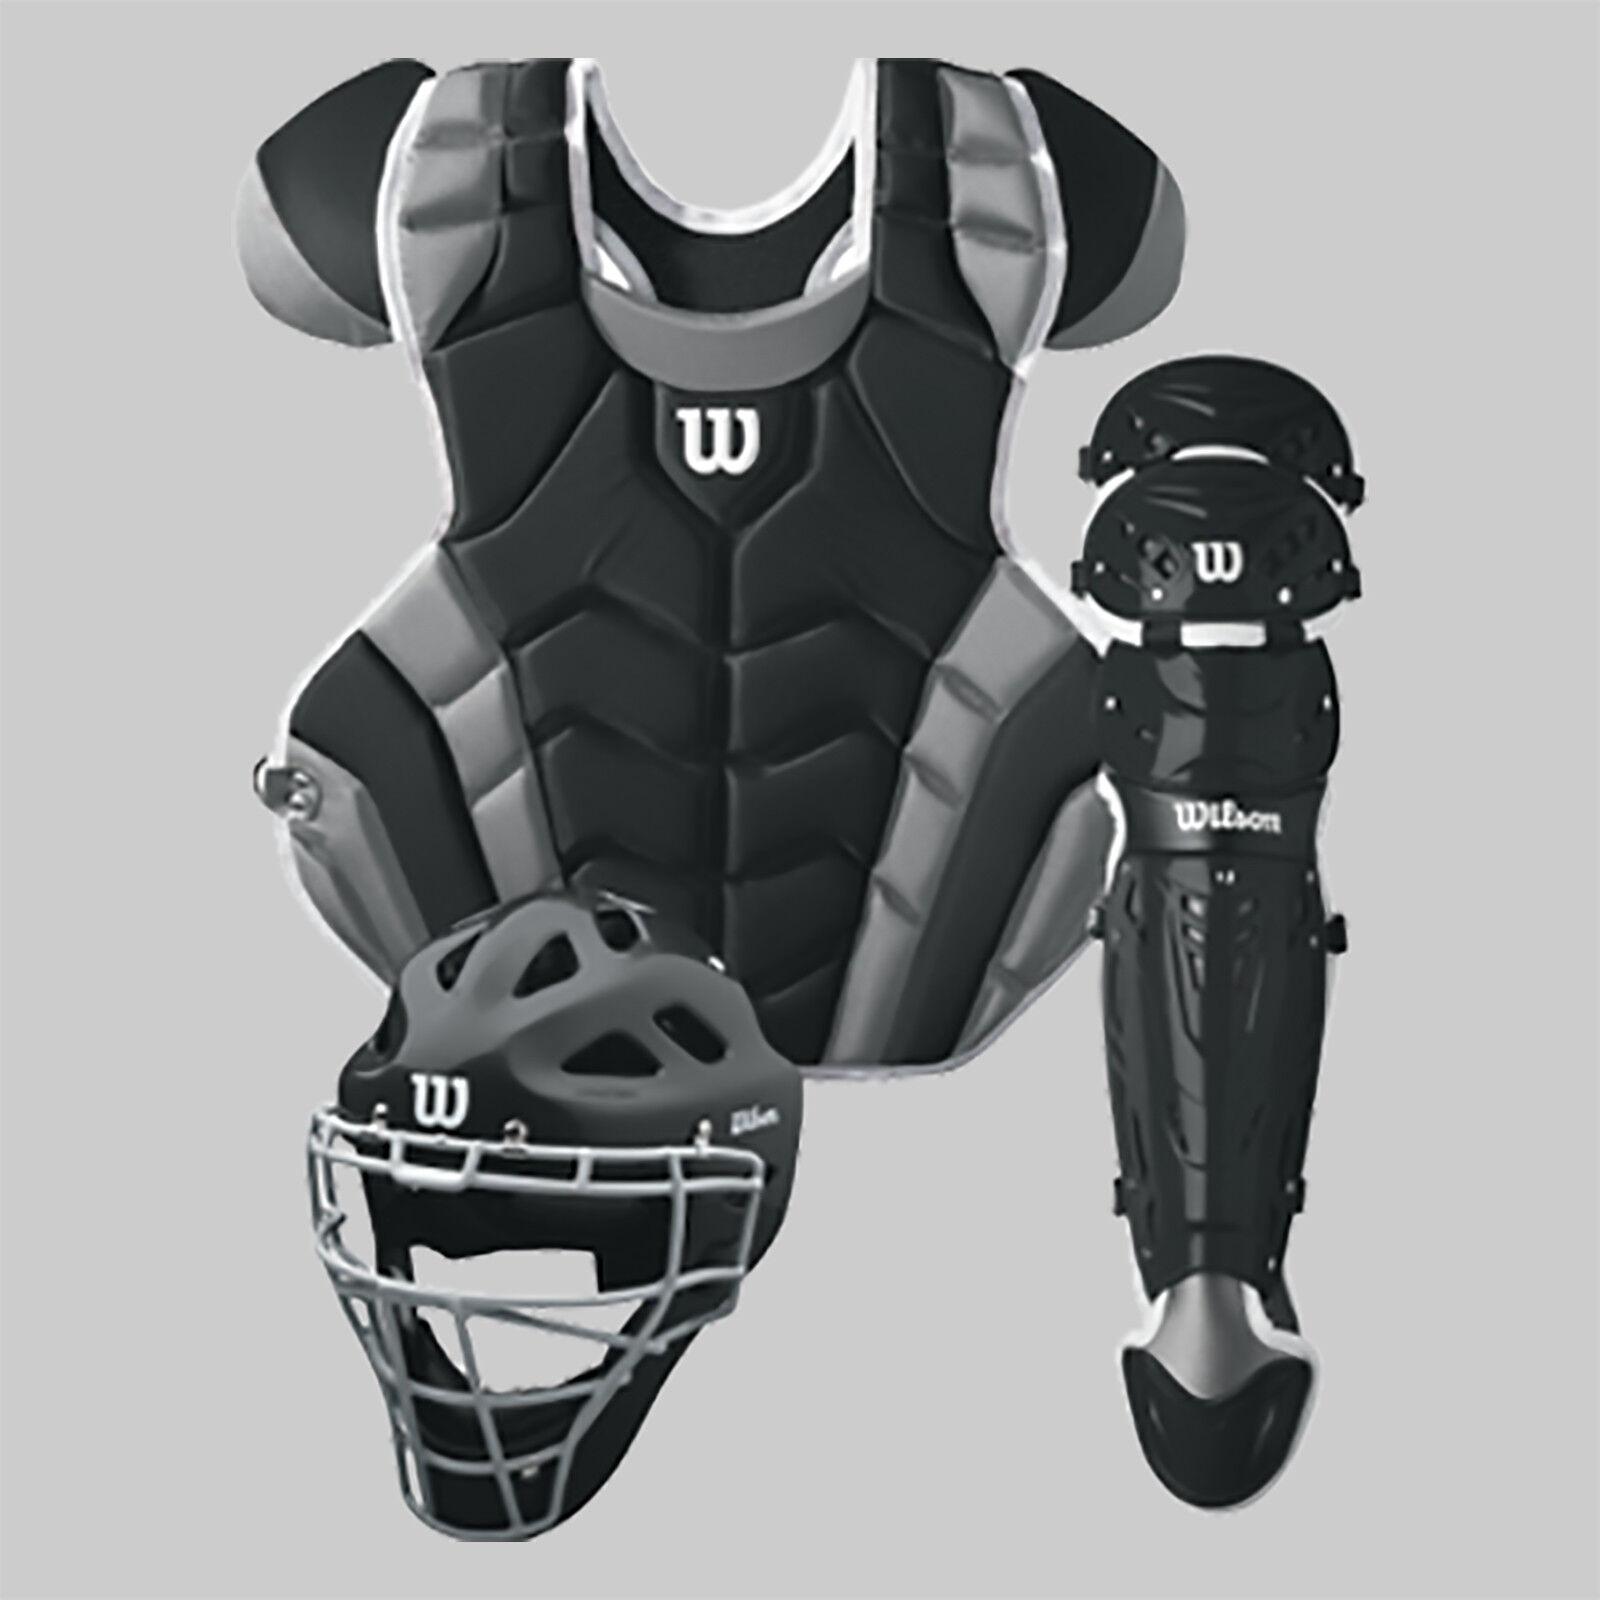 Wilson C1K Intermediate Catcher's Gear Kit - Various colors (NEW) Lists @